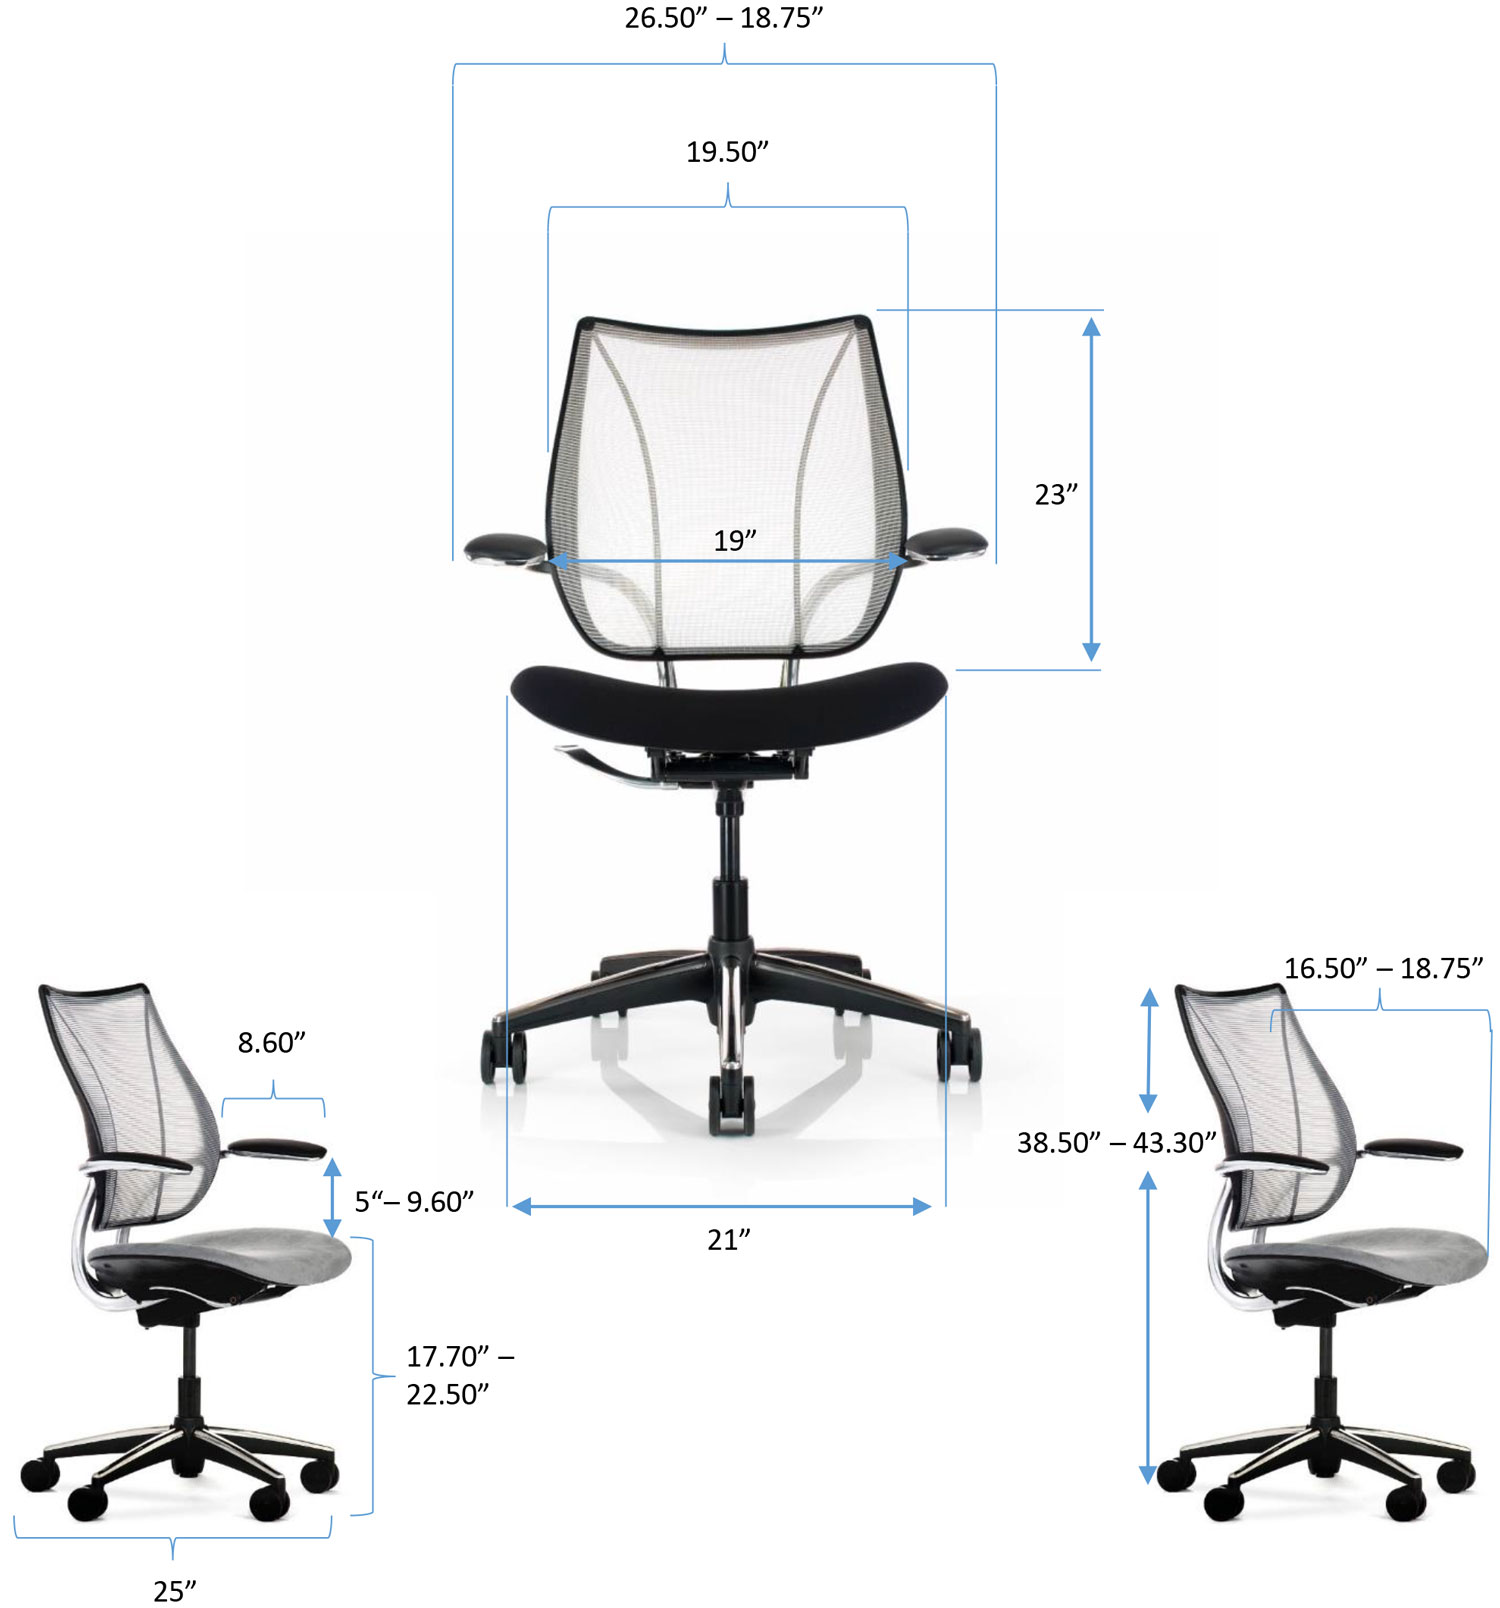 Liberty Chair Specs